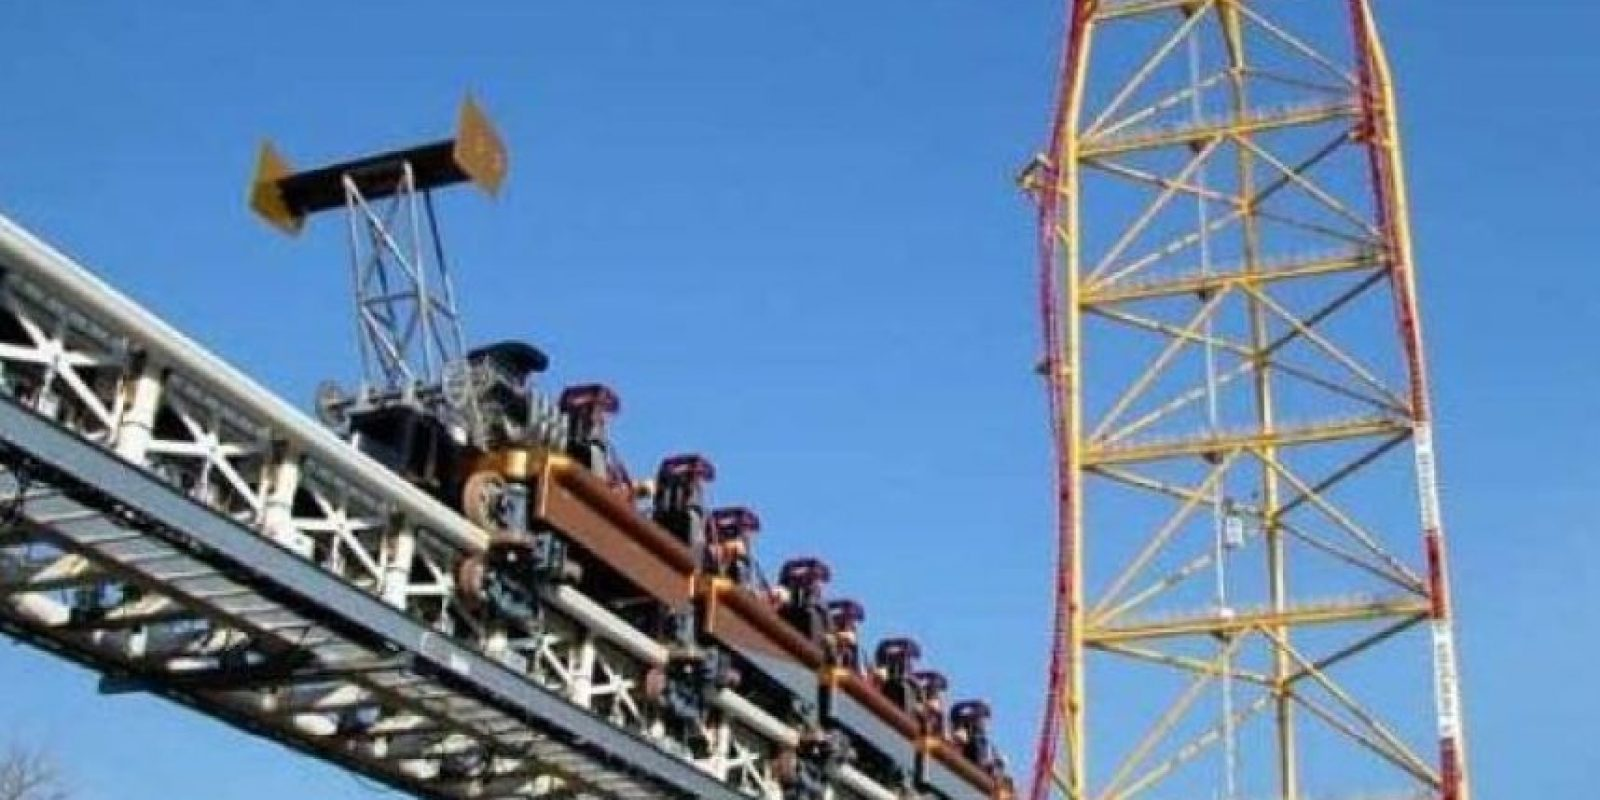 Top Thrill Dragster, Ohio, Estados Unidos Foto:Wikimedia